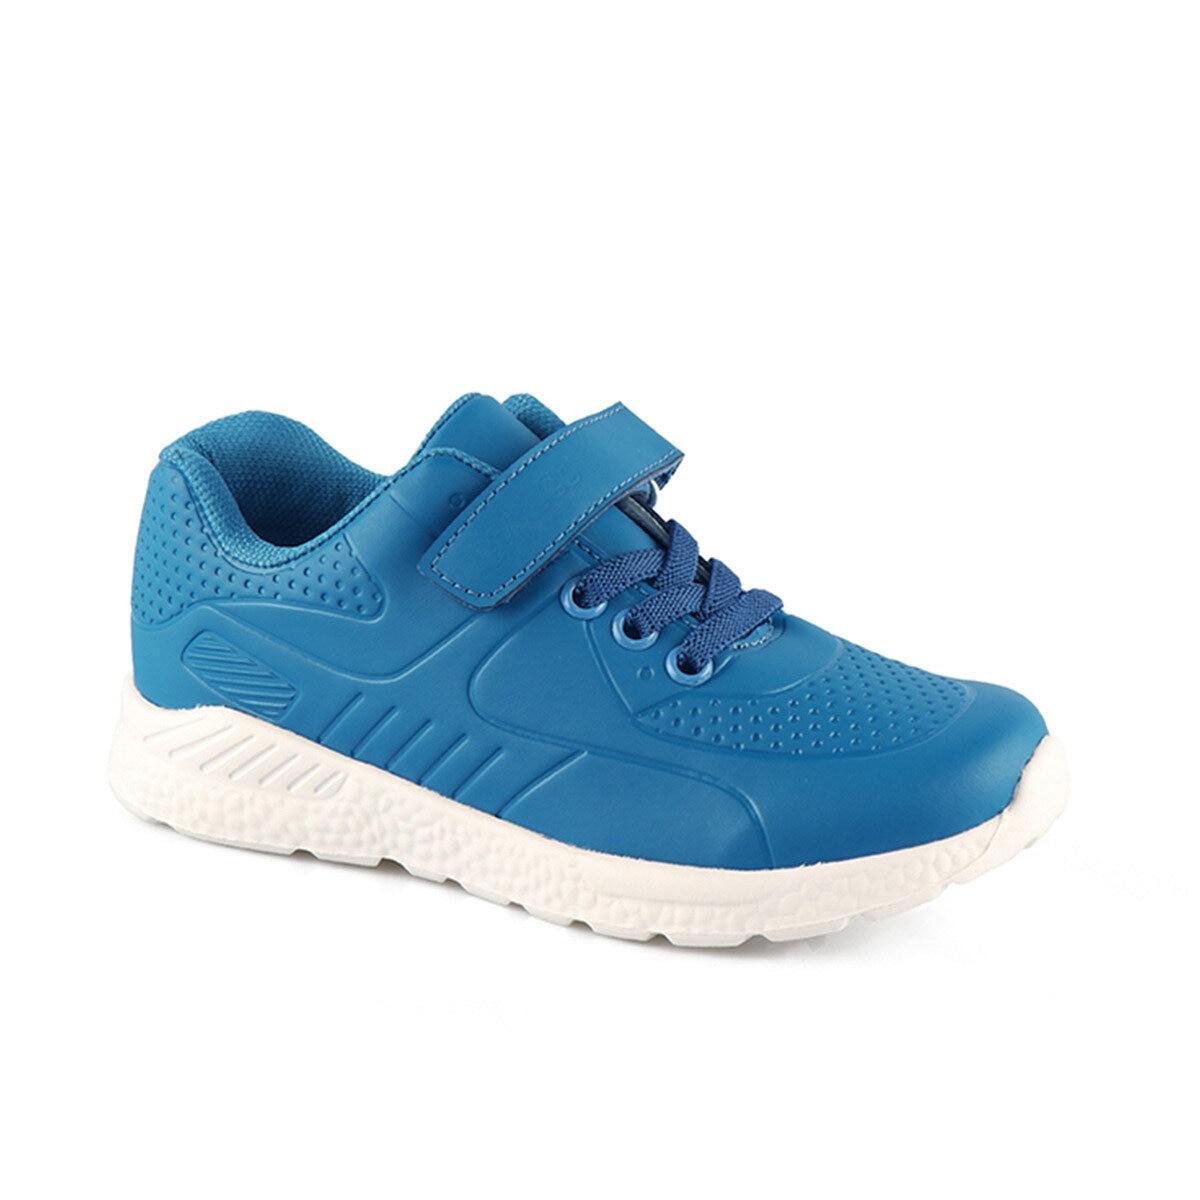 FLO 348.18K.122 Saks Male Child Sneaker Shoes VICCO